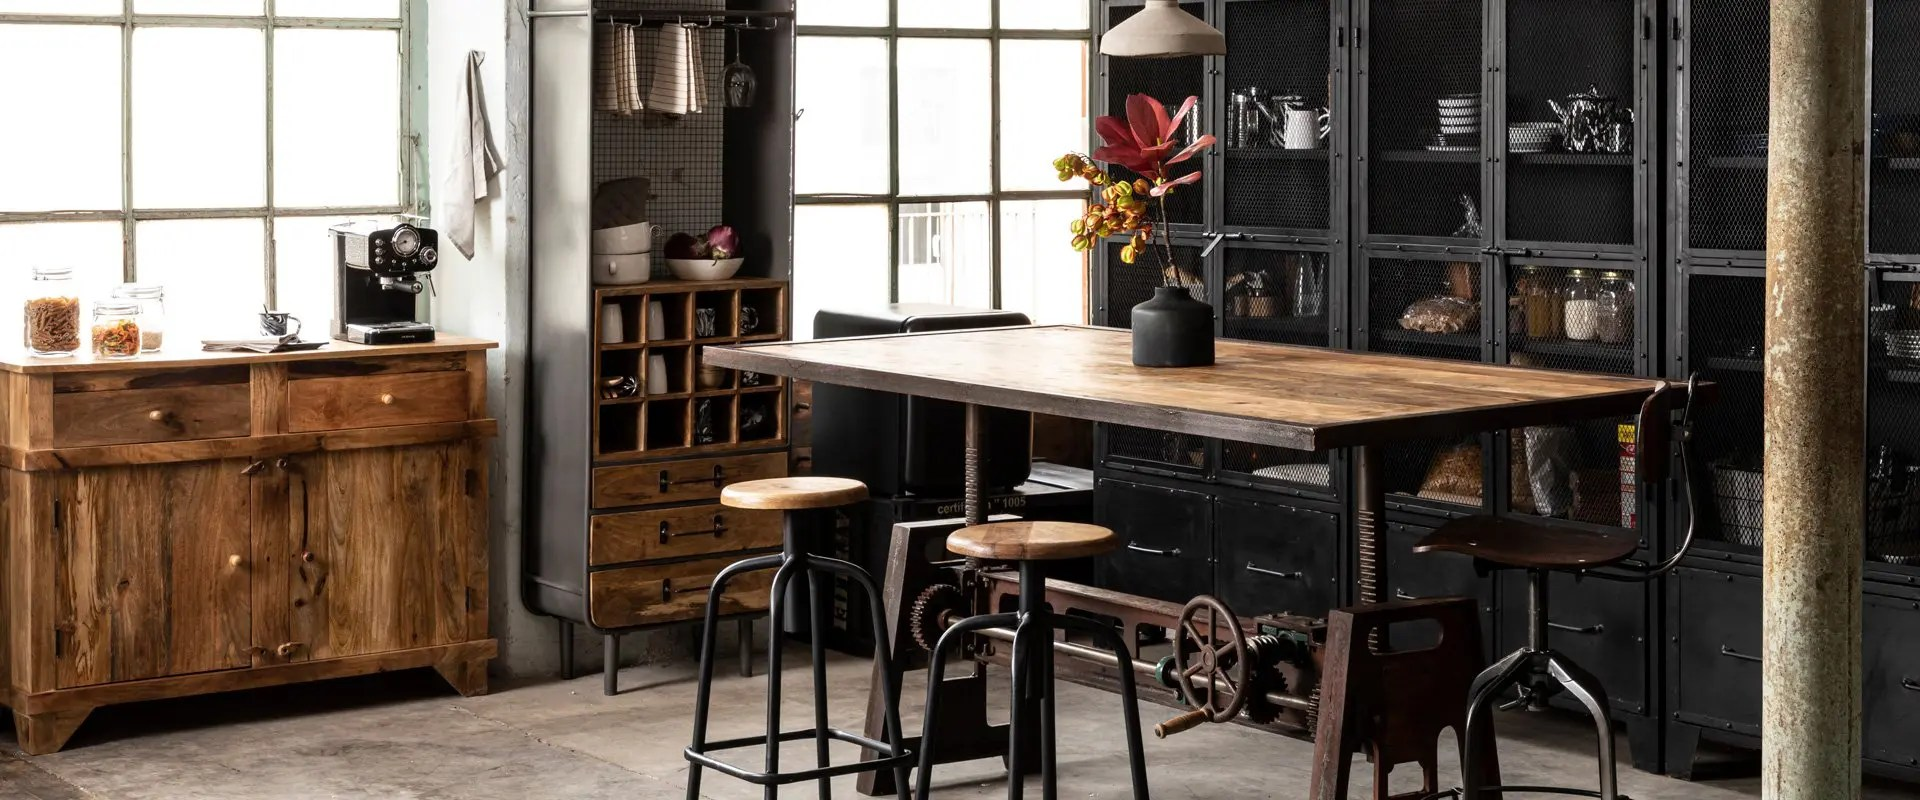 mobilier vintage et industriel chr sledge